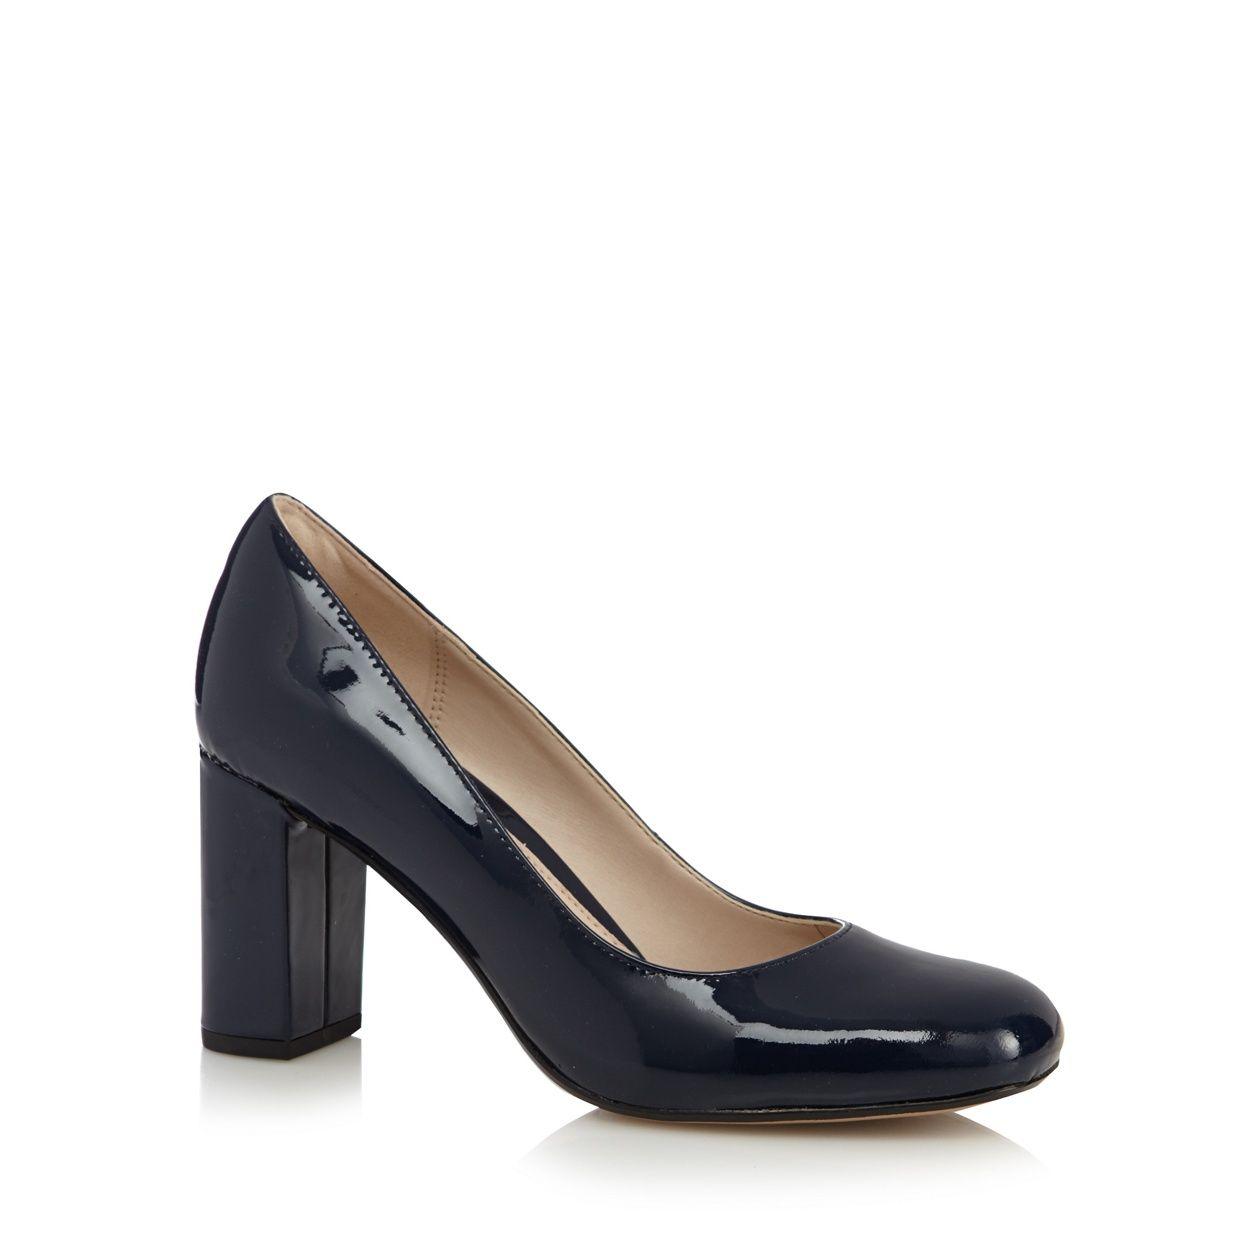 d2bb9cf2c9a Clarks Navy 'Gabriel Mist' leather patent high heeled shoes ...